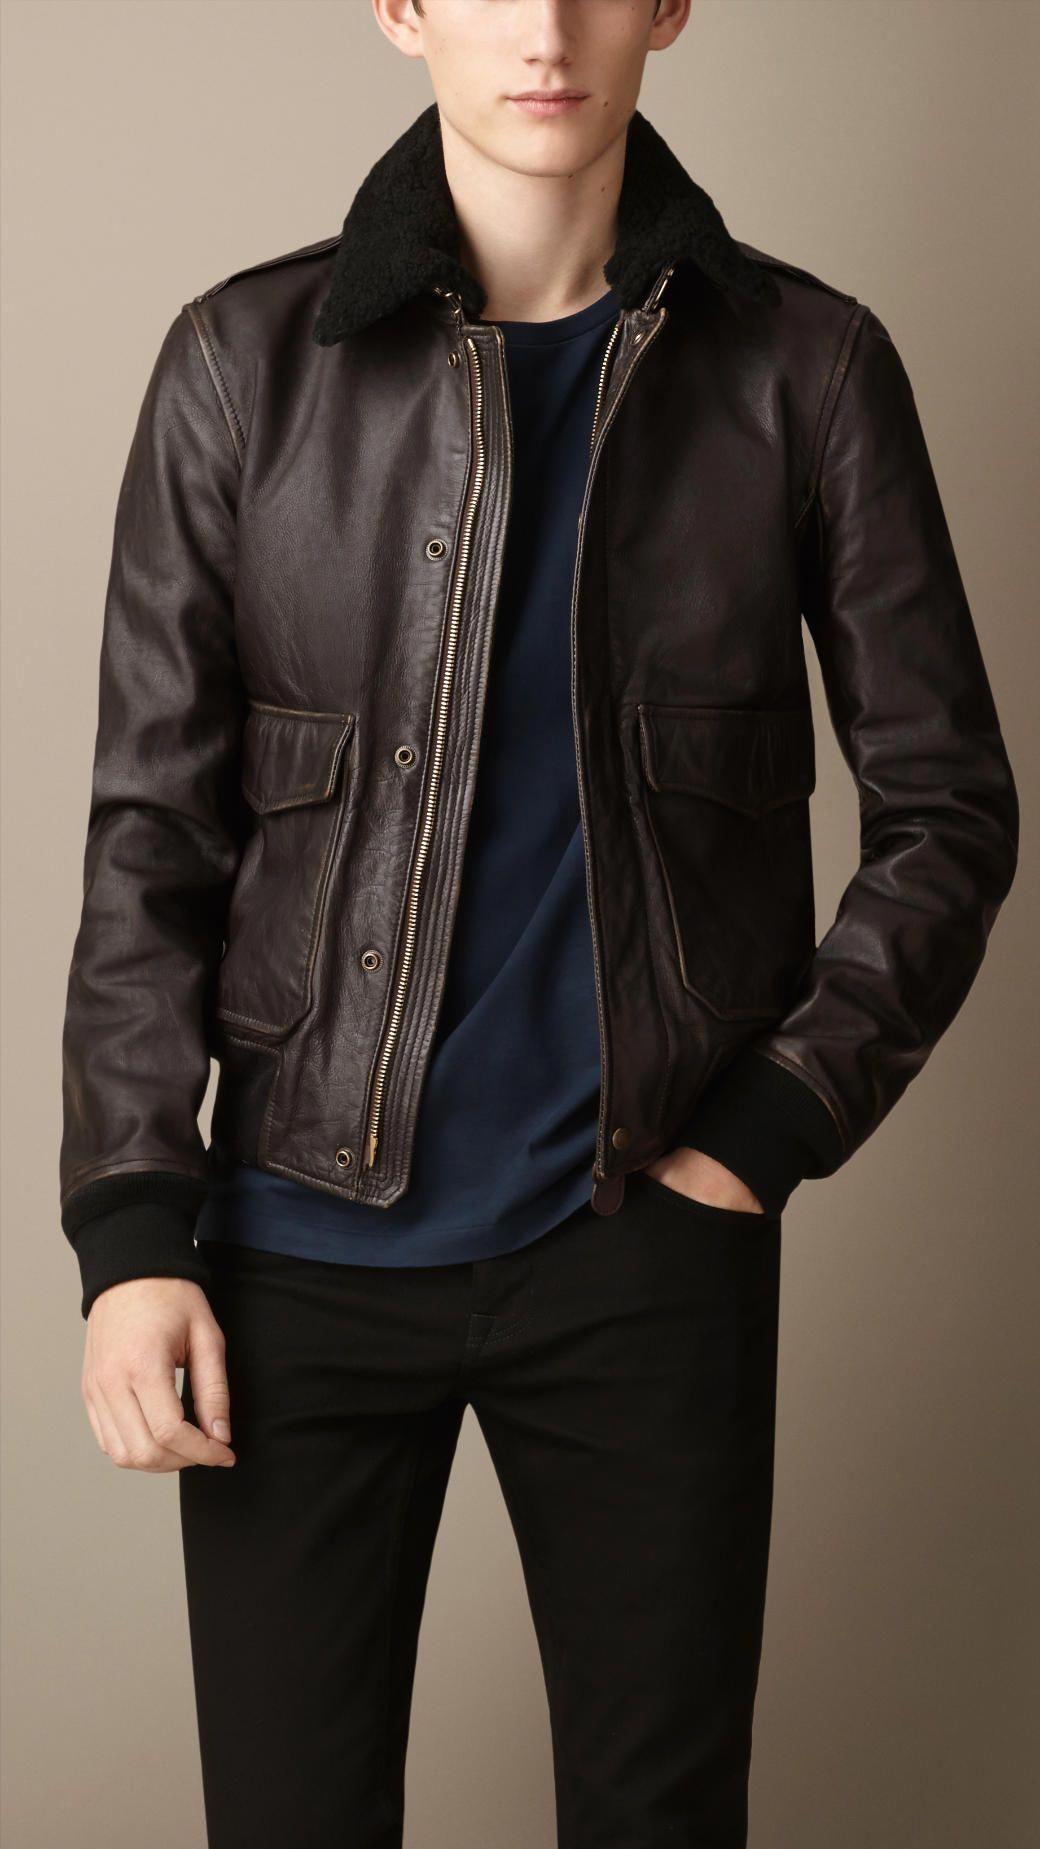 Burberry Leather Aviator Jacket With Shearling Collar Mensfashionrugged Leather Flight Jacket Stylish Leather Jacket Leather Jacket Men [ 1849 x 1040 Pixel ]